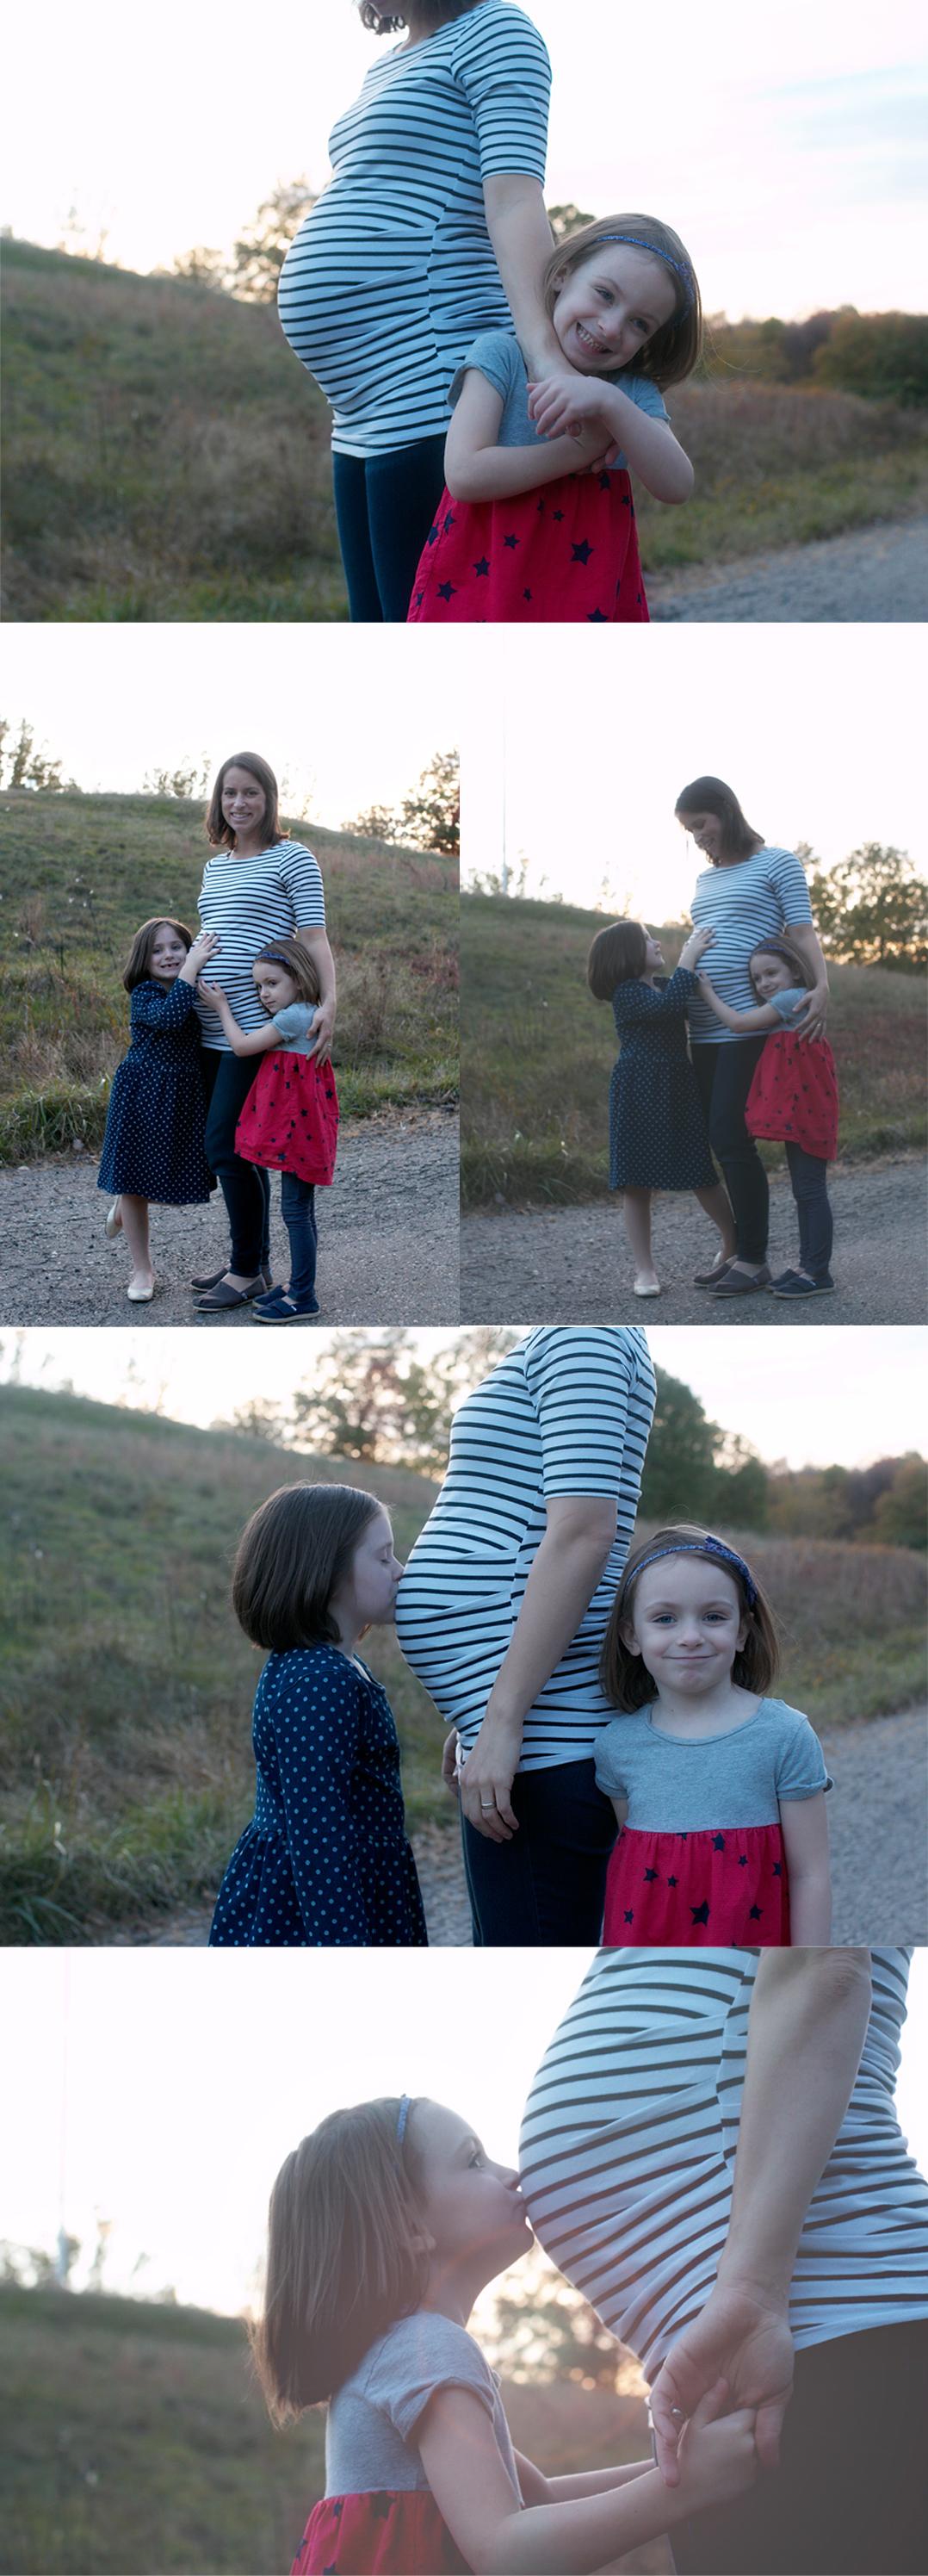 McNelis-fall-family-photos-4